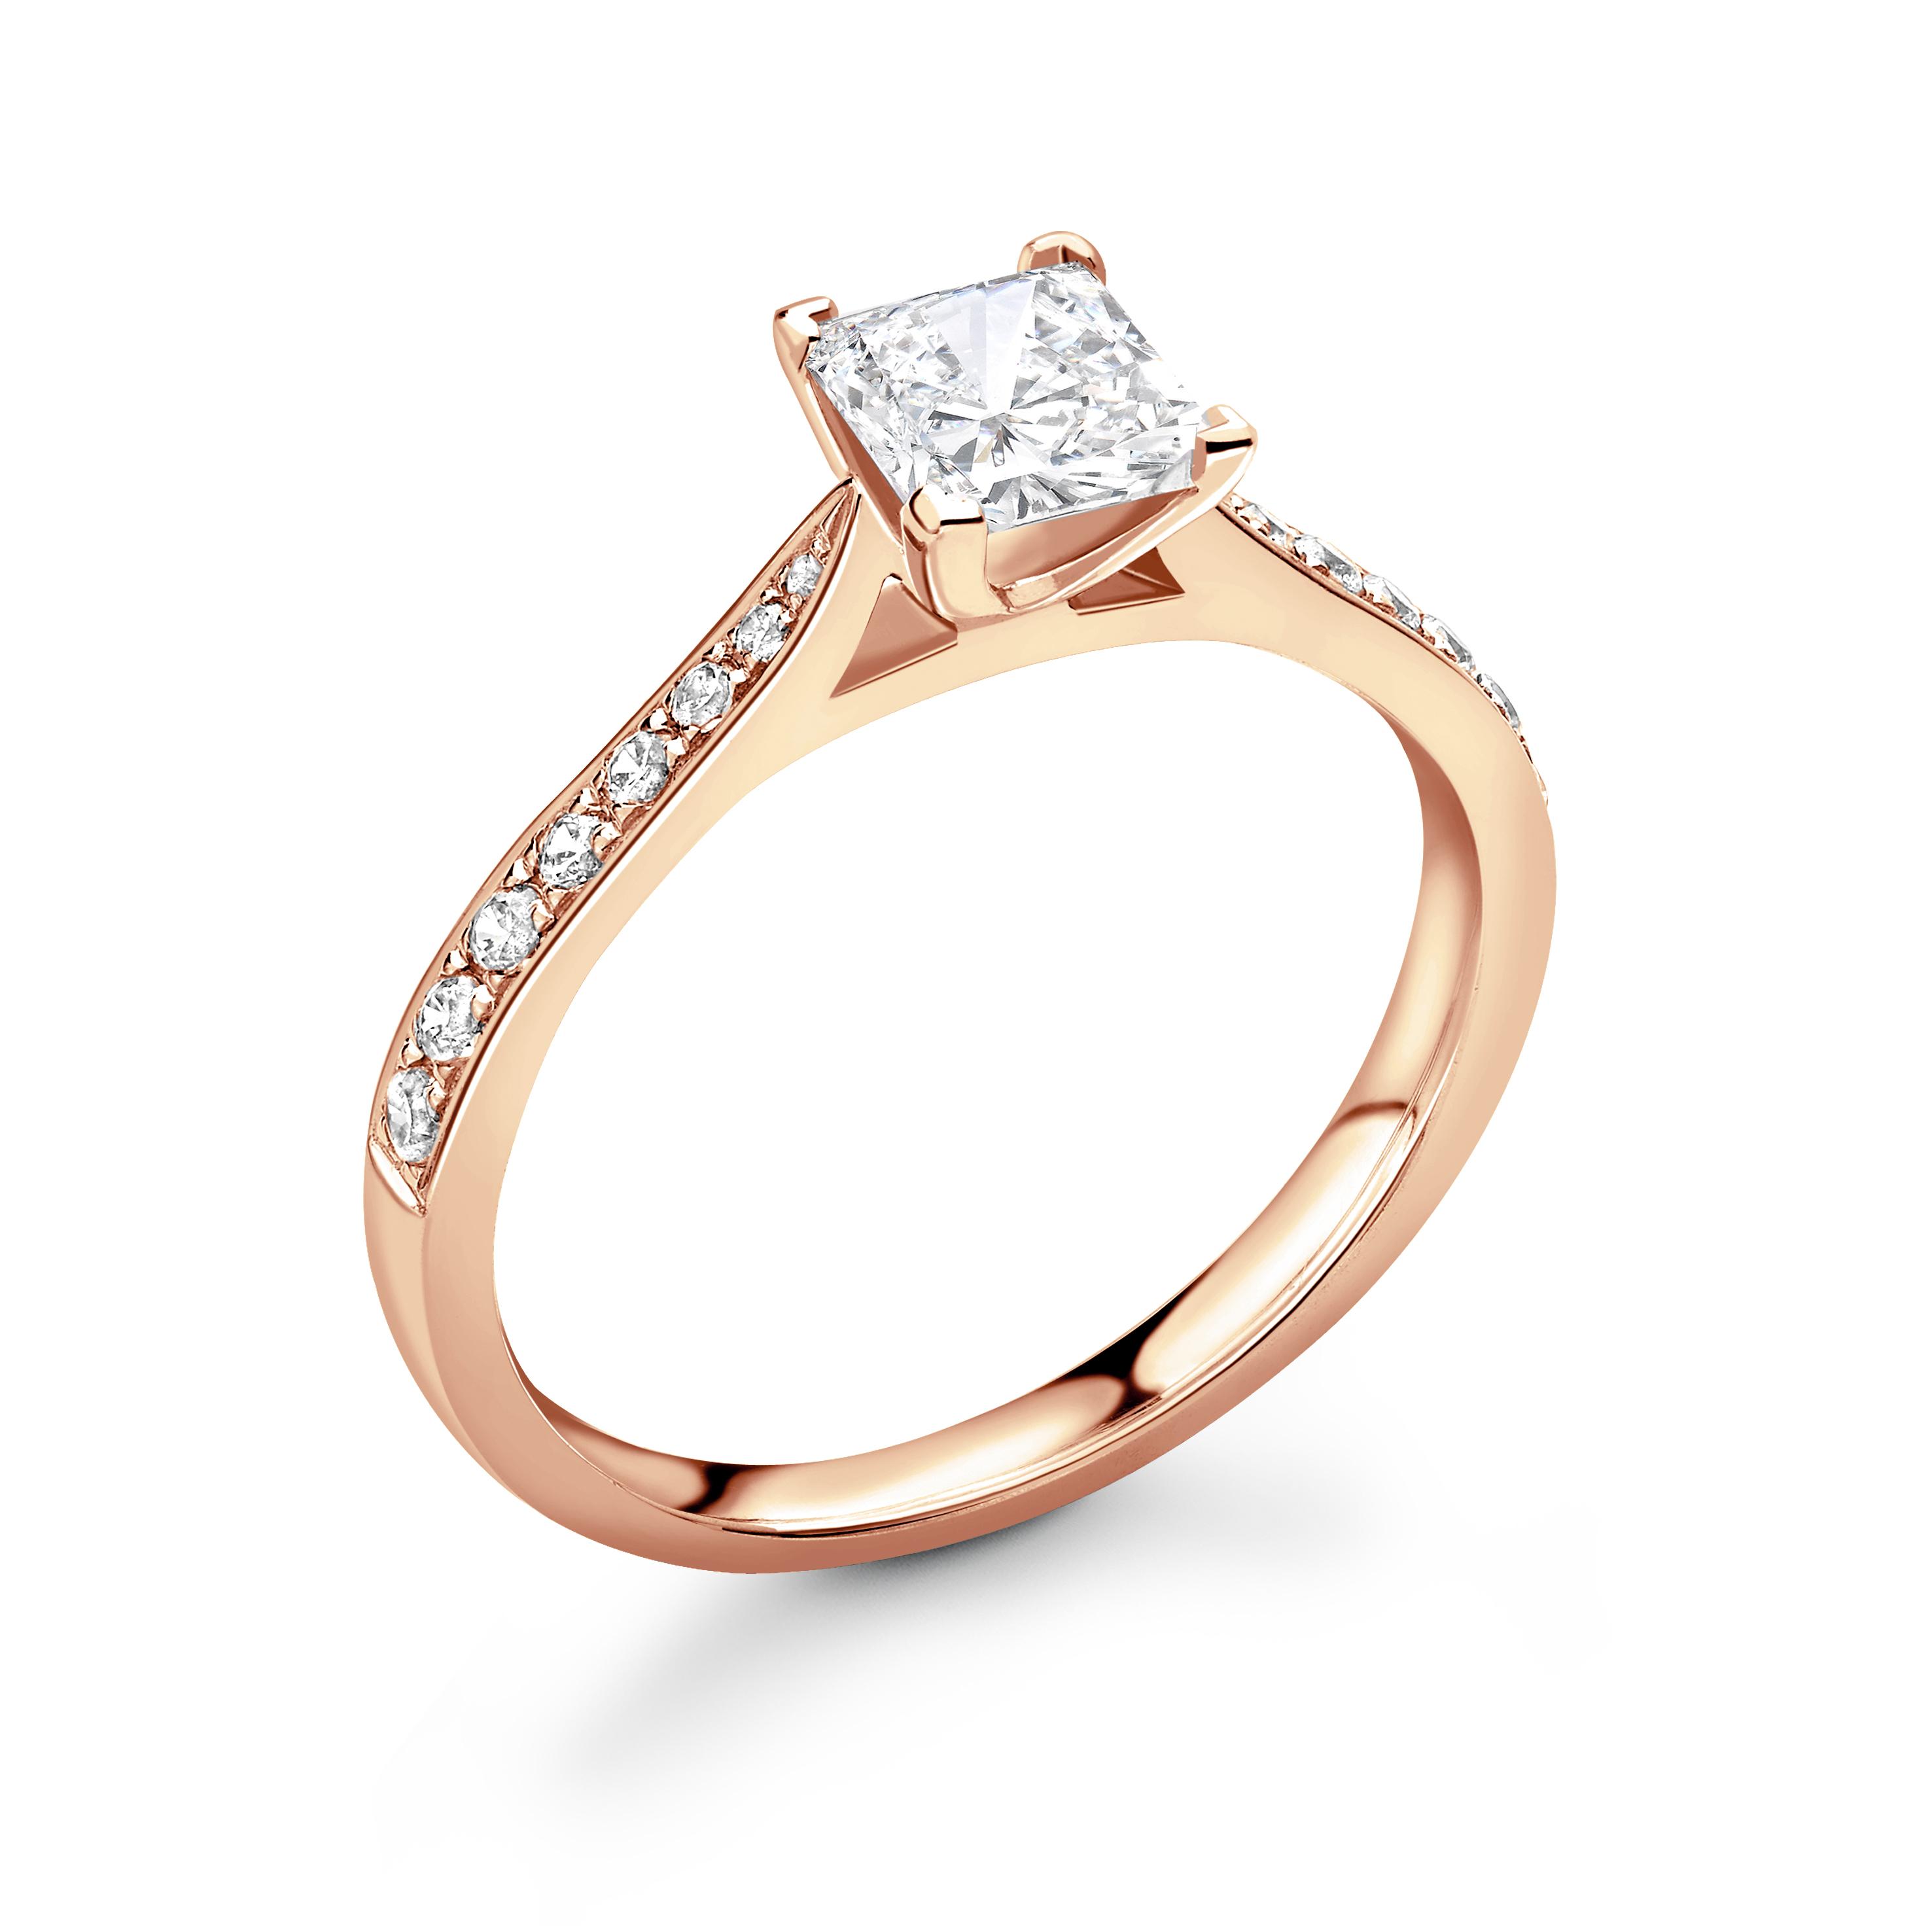 Delicate Tapering Down Shoulder Set Princess Diamond Engagement Ring